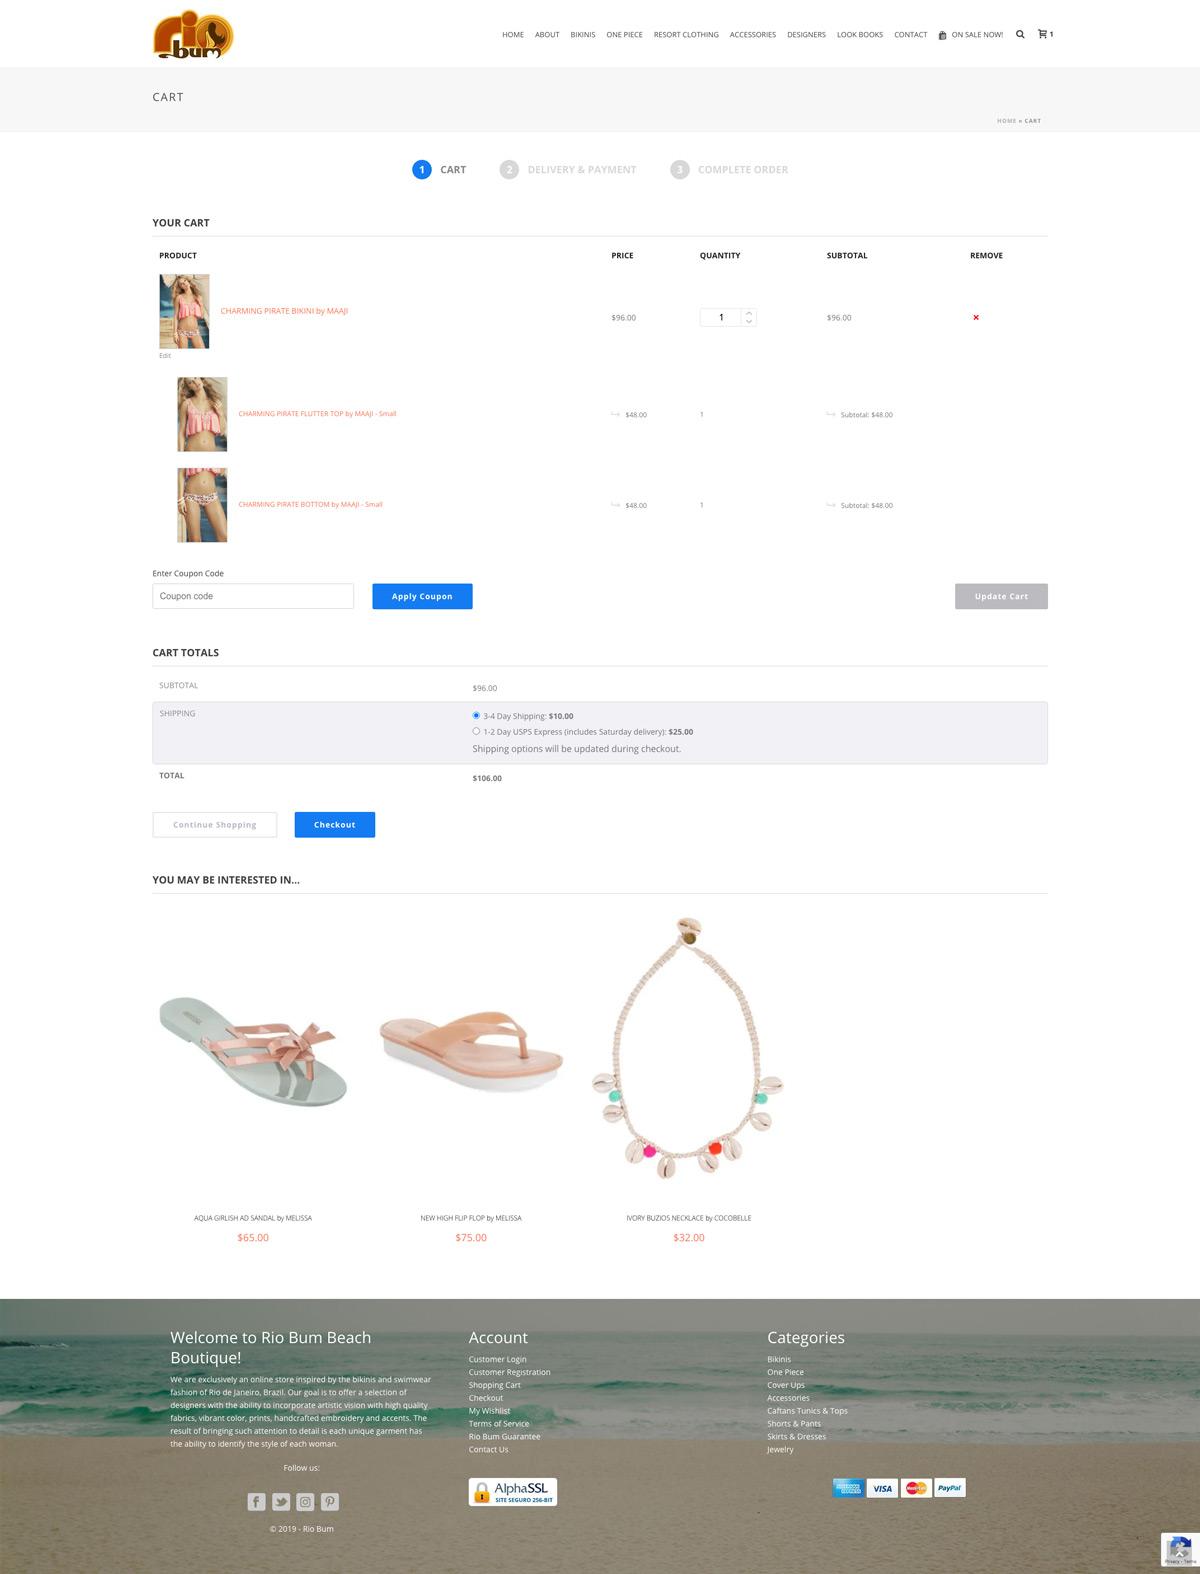 ecommerce-website-design-cypress-the-woodlands-4